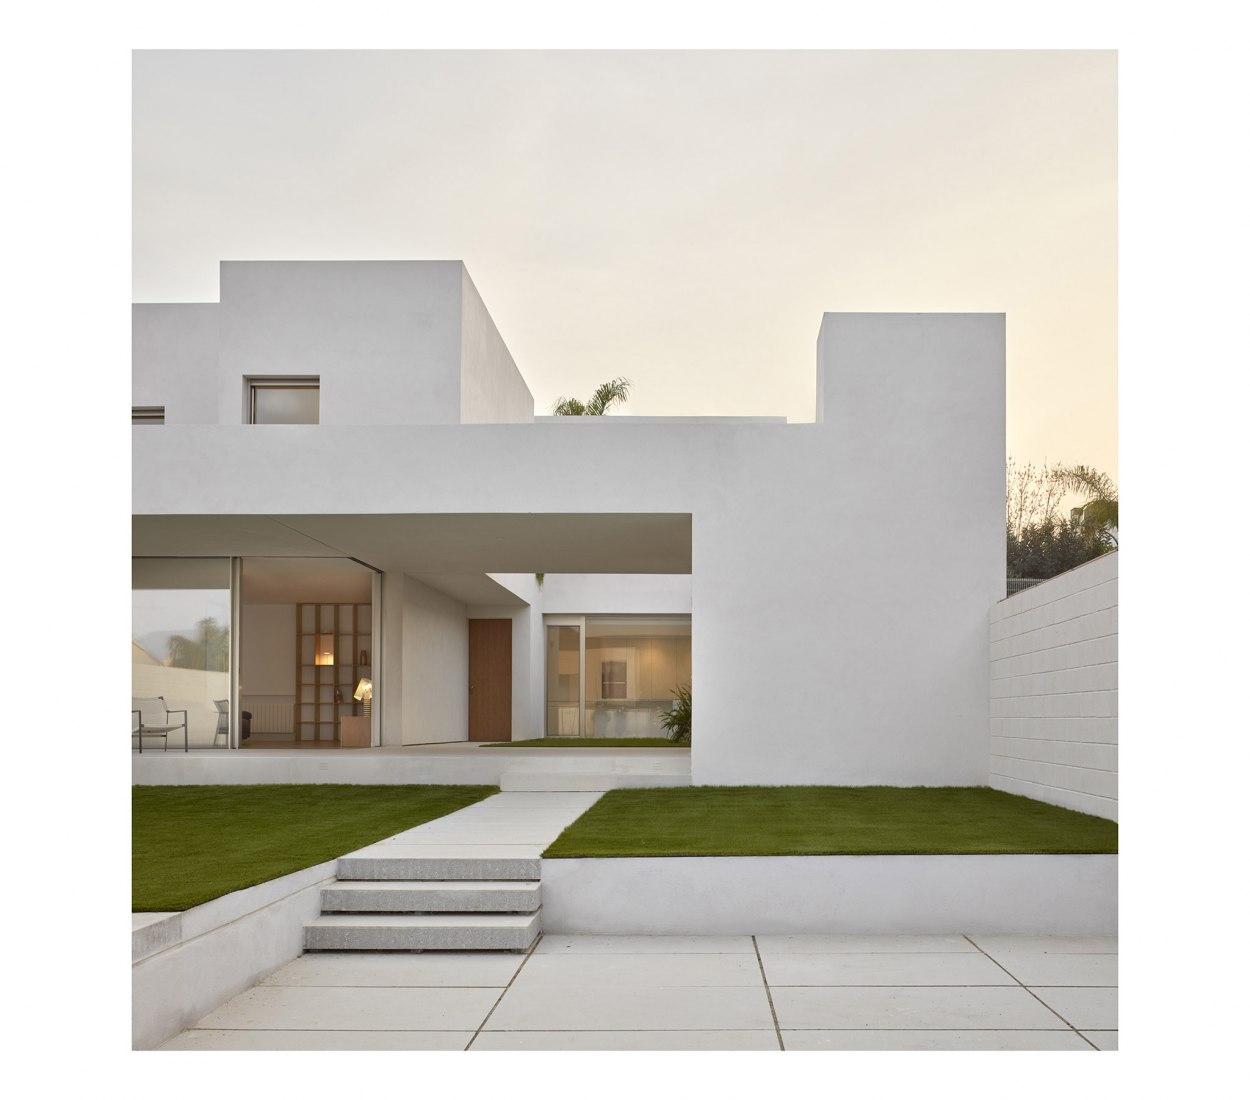 Casa AVM por Horma. Fotografía por Mariela Apollonio.